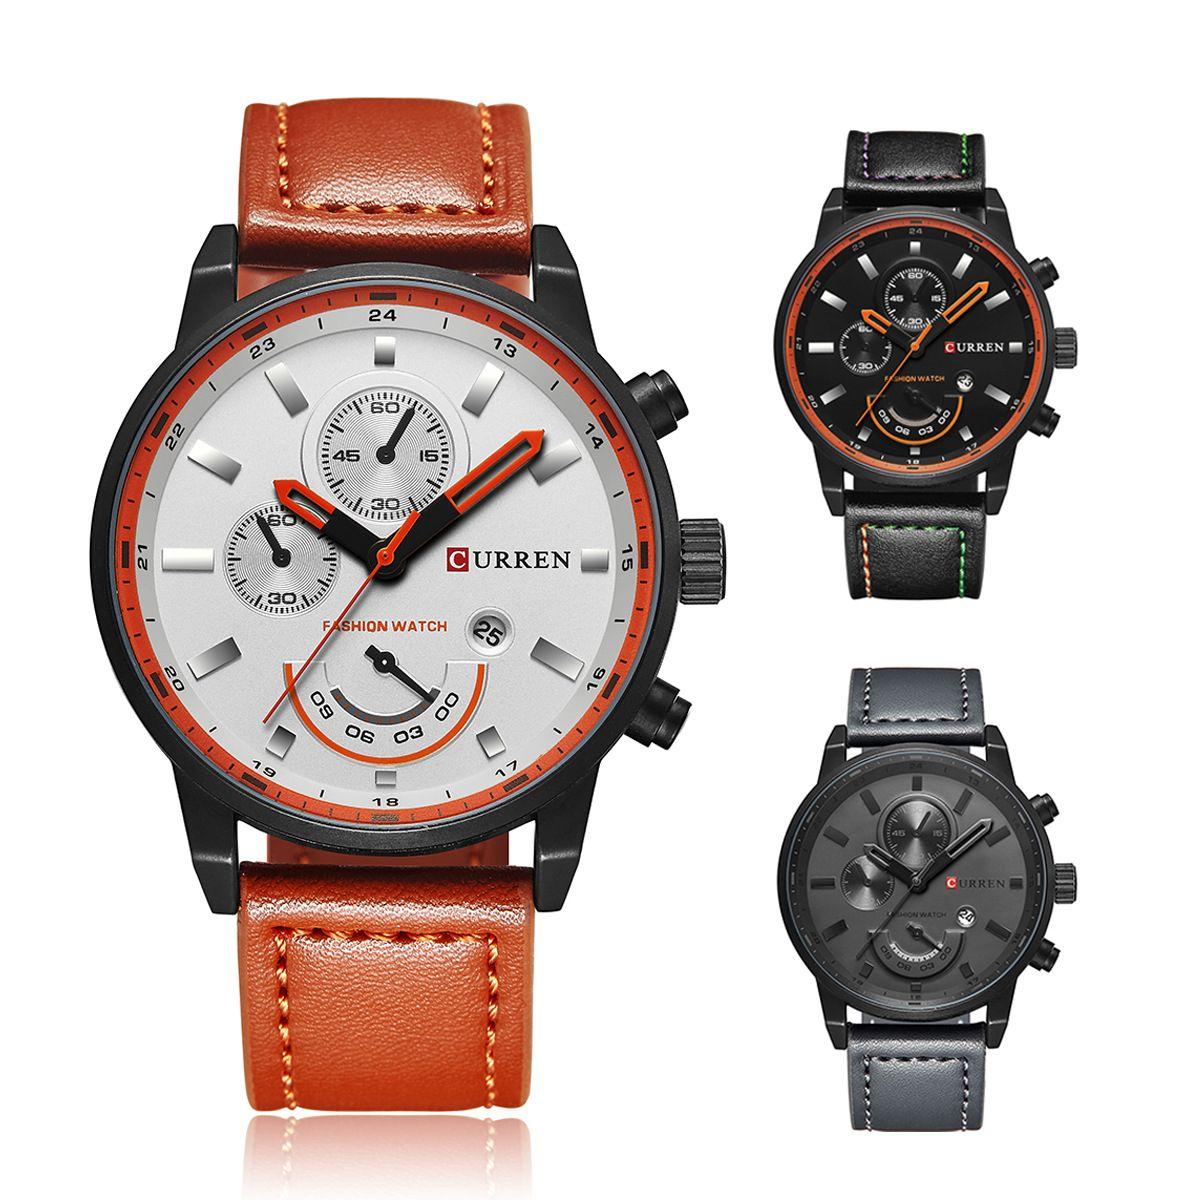 75deef2bb4b Compre Top Marca De Luxo Dos Homens Relógios Desportivos Moda Casual Relógio  De Quartzo Homens Militar Relógio De Pulso Masculino Relogio Relógio CURREN  ...